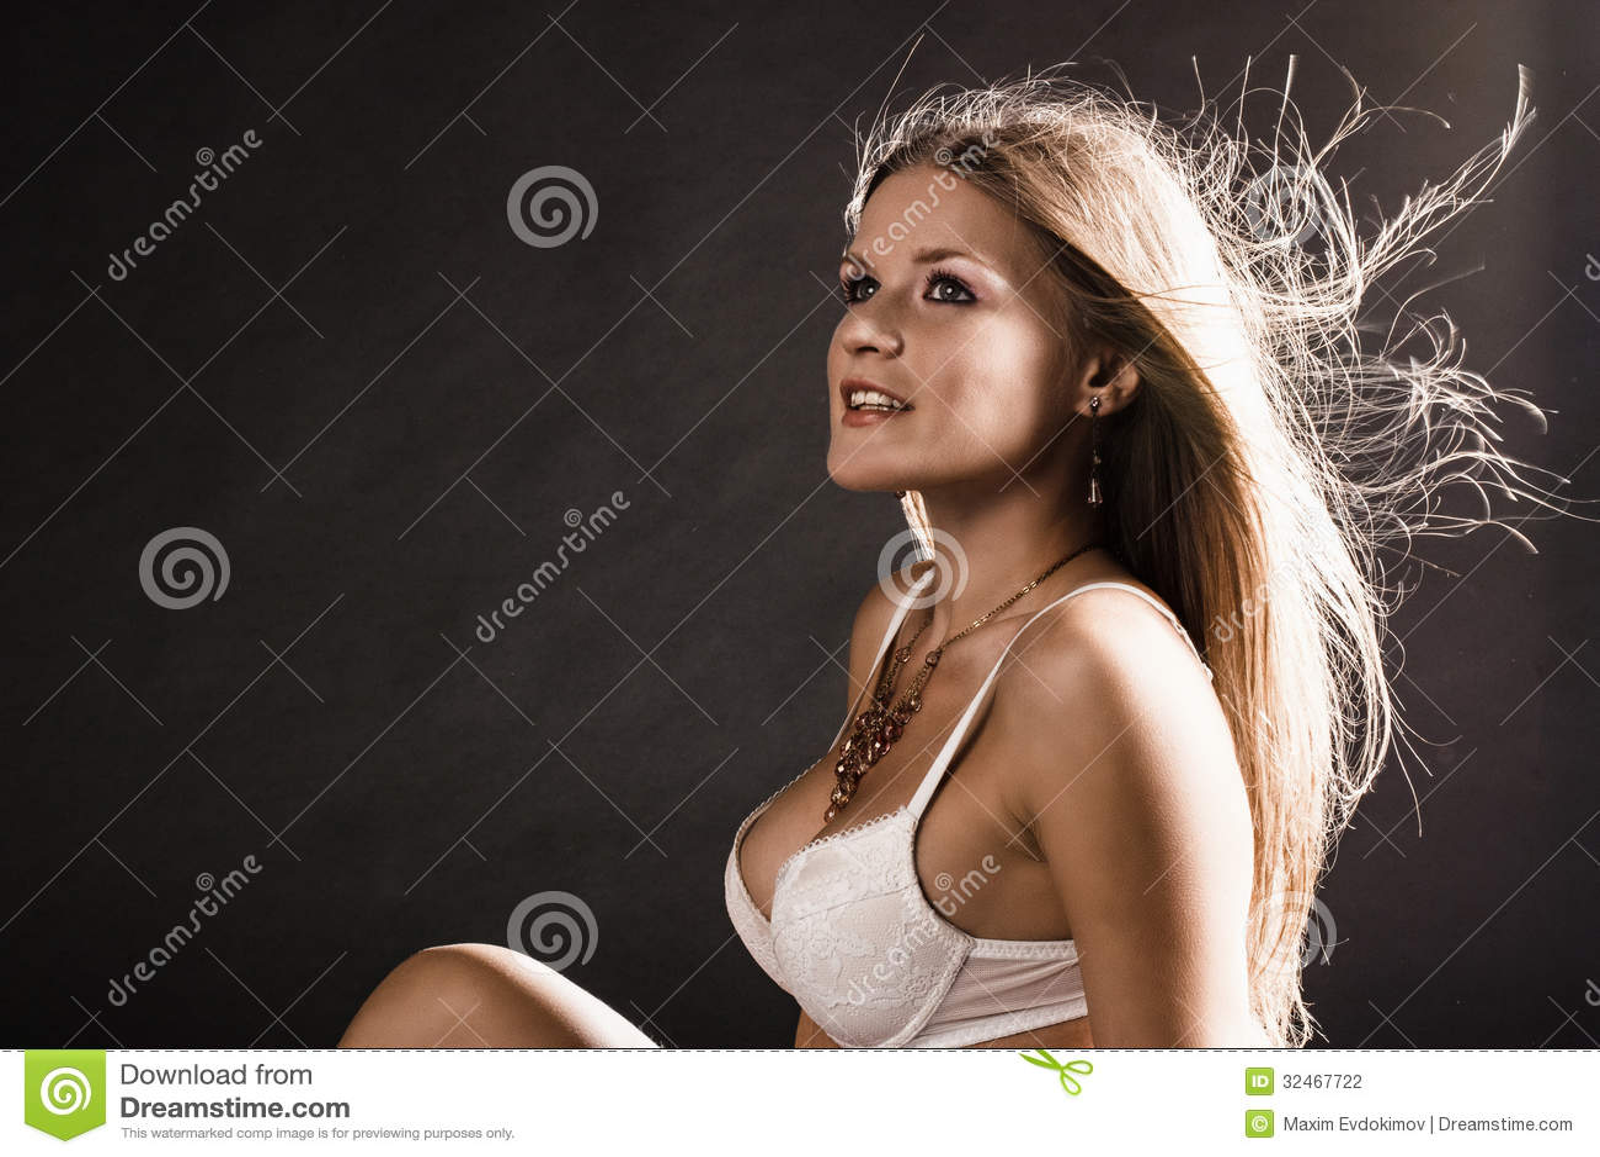 Erotic young girl photography